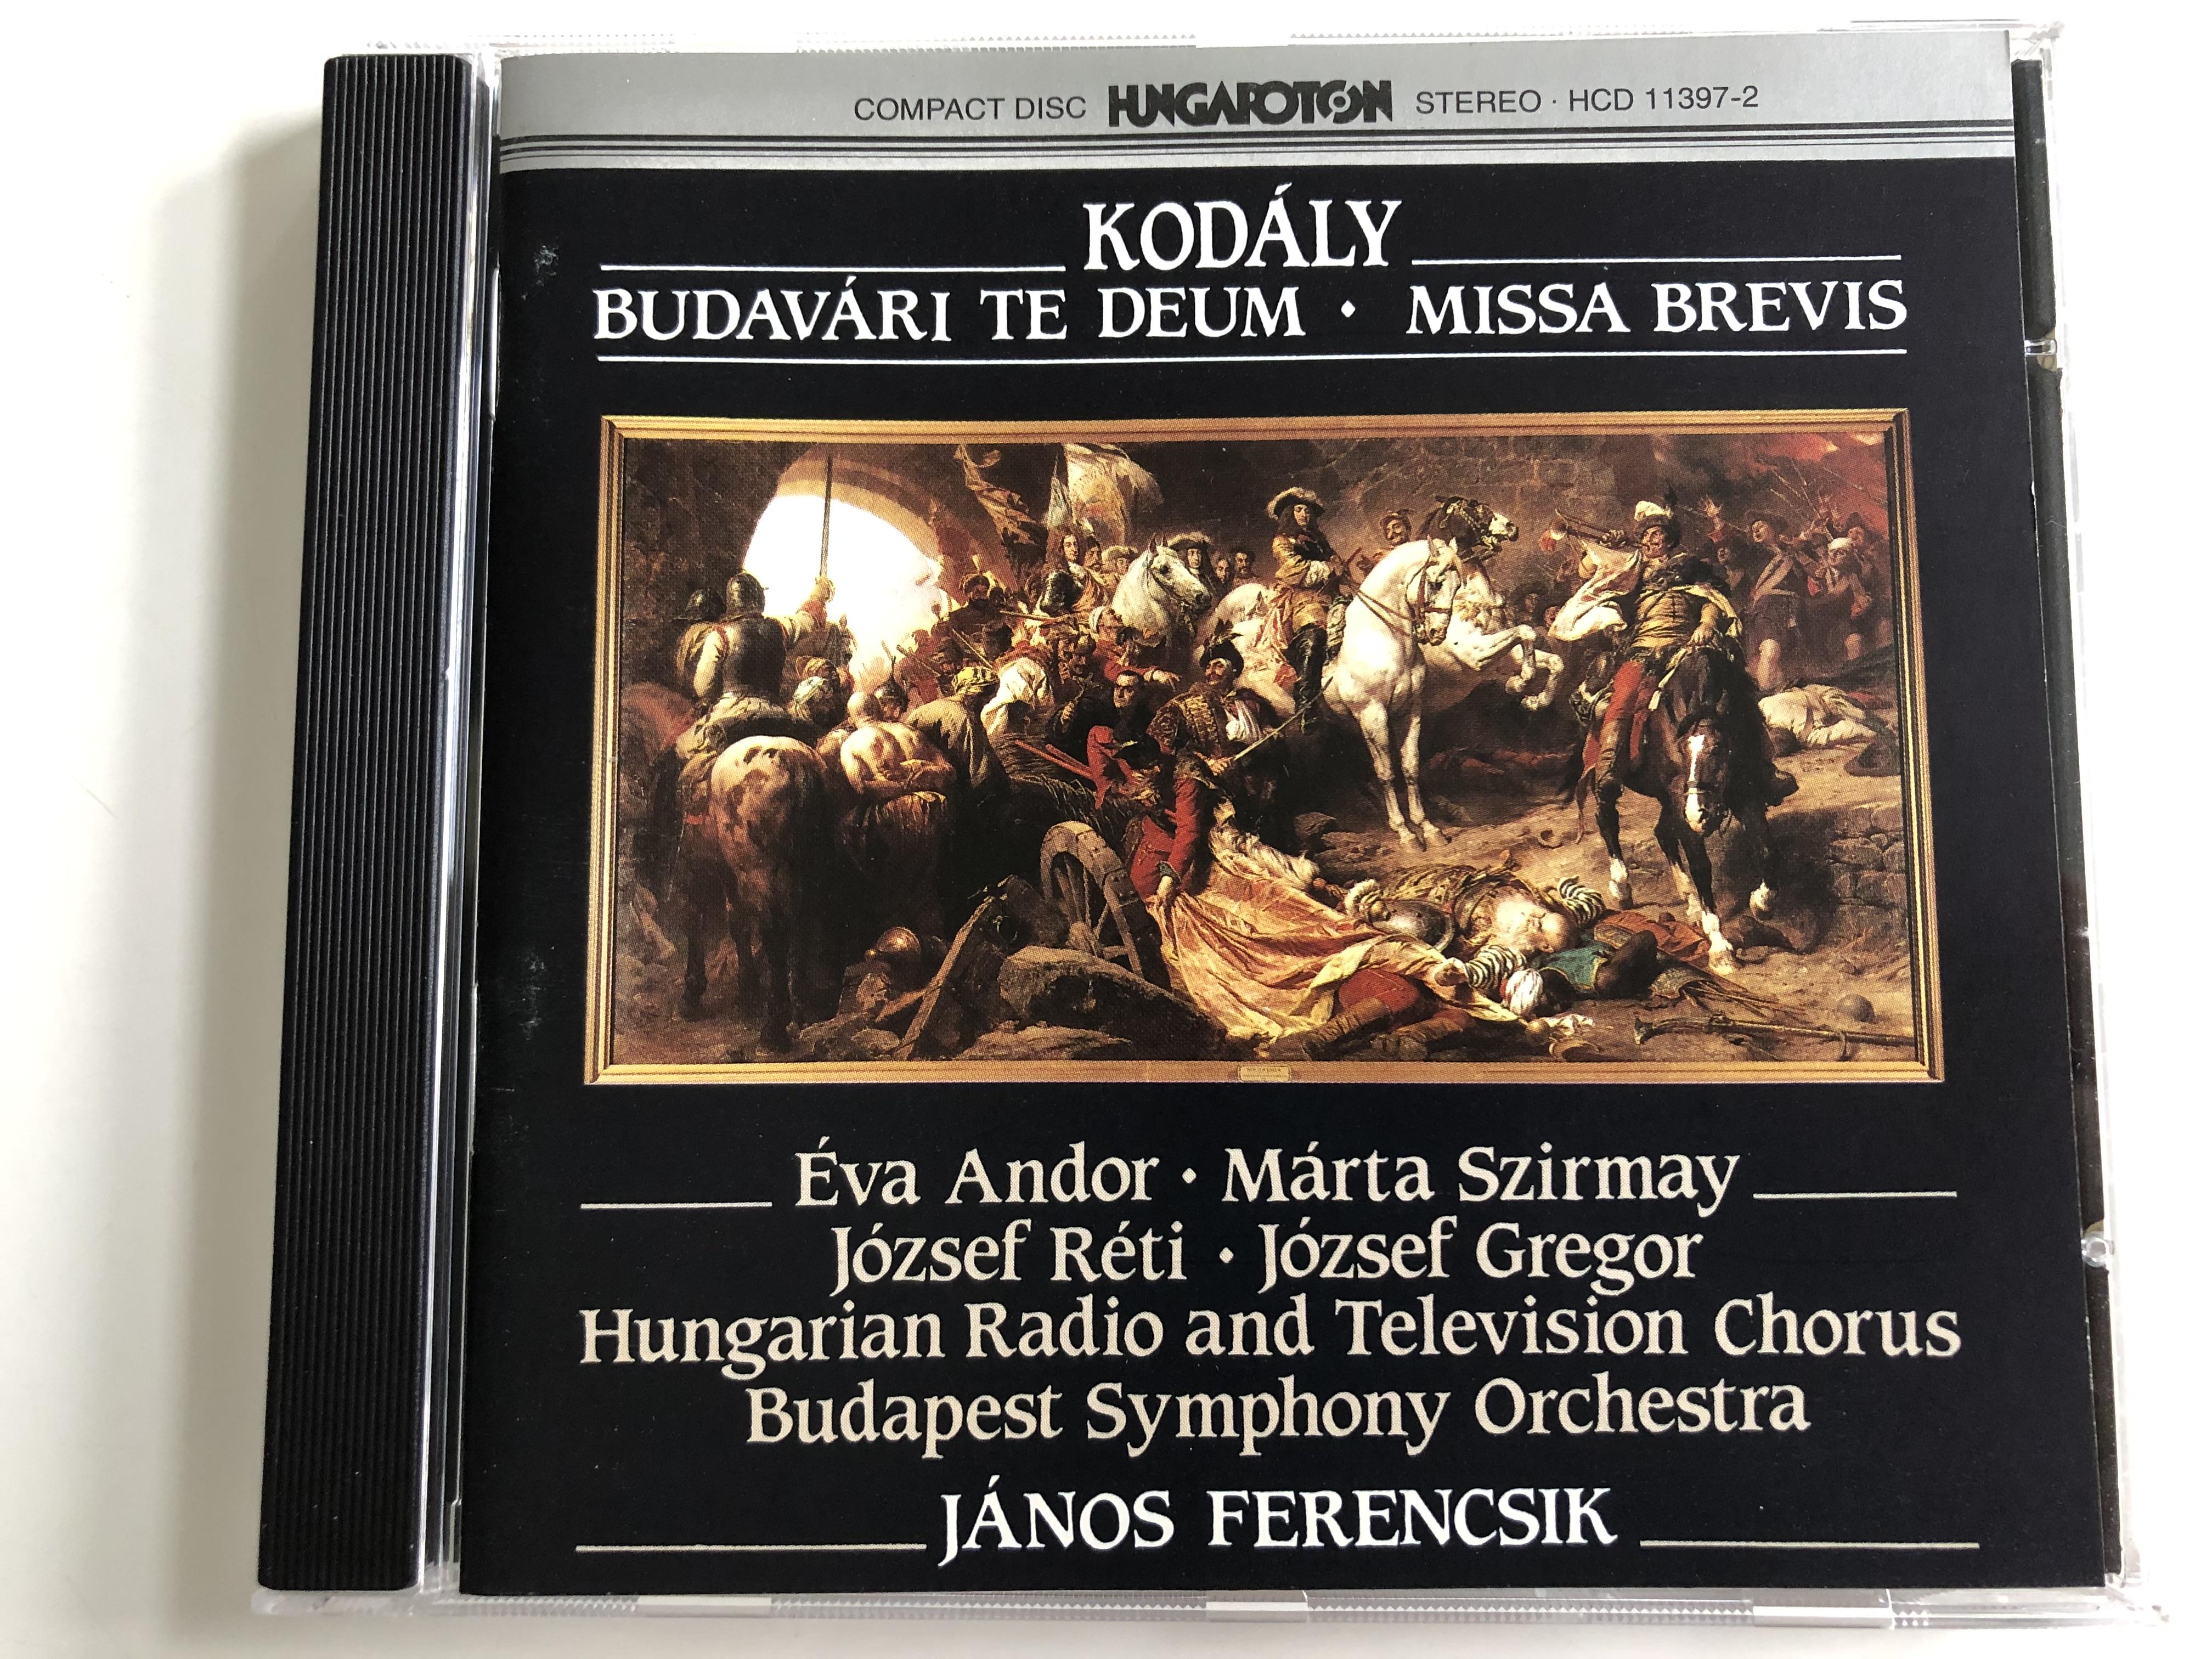 kod-ly-budav-ri-te-deum-missa-brevis-va-andor-m-rta-szirmay-j-zsef-r-ti-j-zsef-gregor-hungarian-radio-and-television-chorus-budapest-symphony-orchestra-conducted-j-nos-ferencsik-hung-1-.jpg